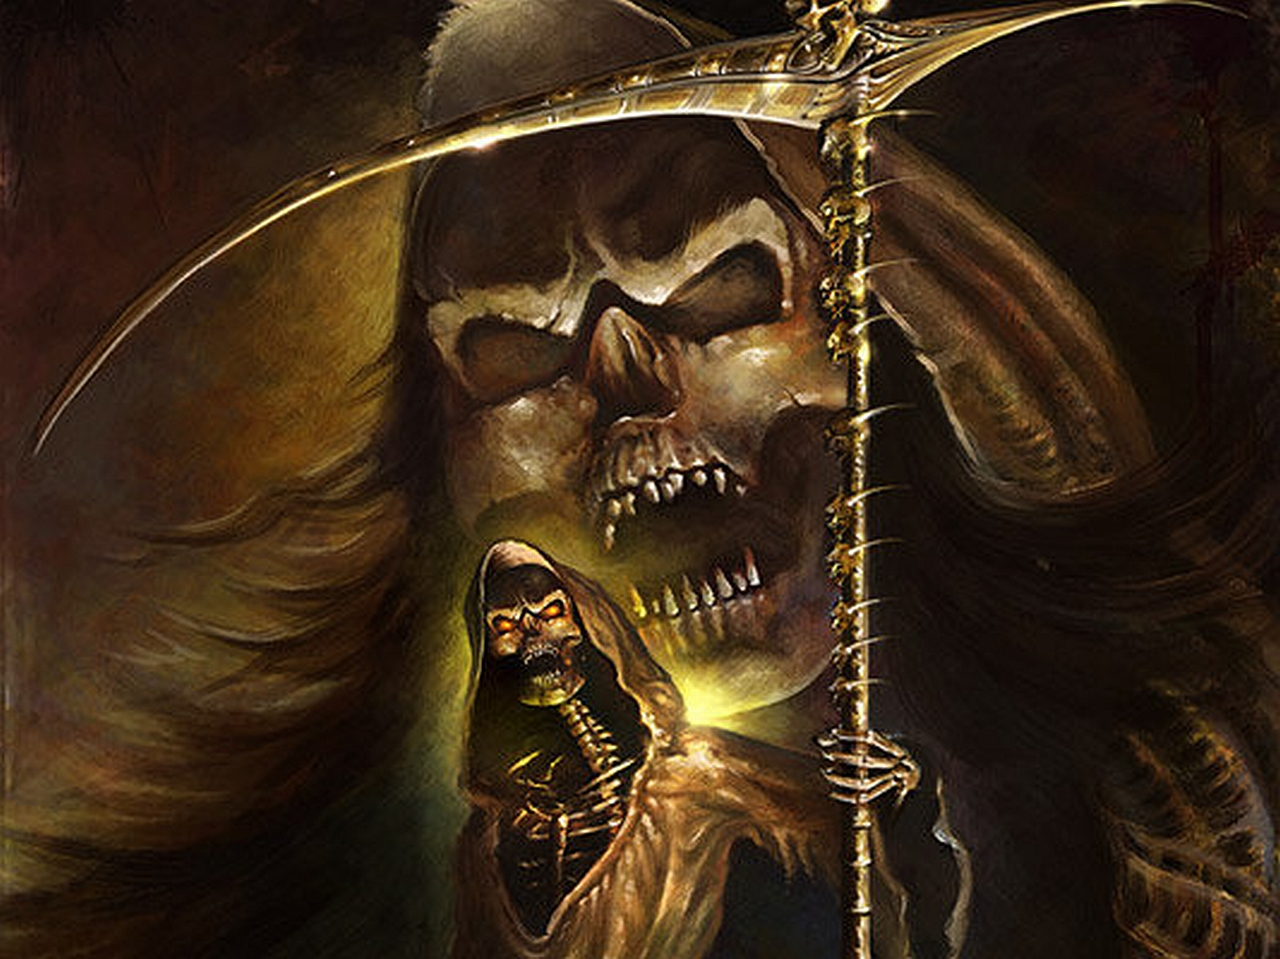 M246rk Grim Reaper Bakgrund 1280x959